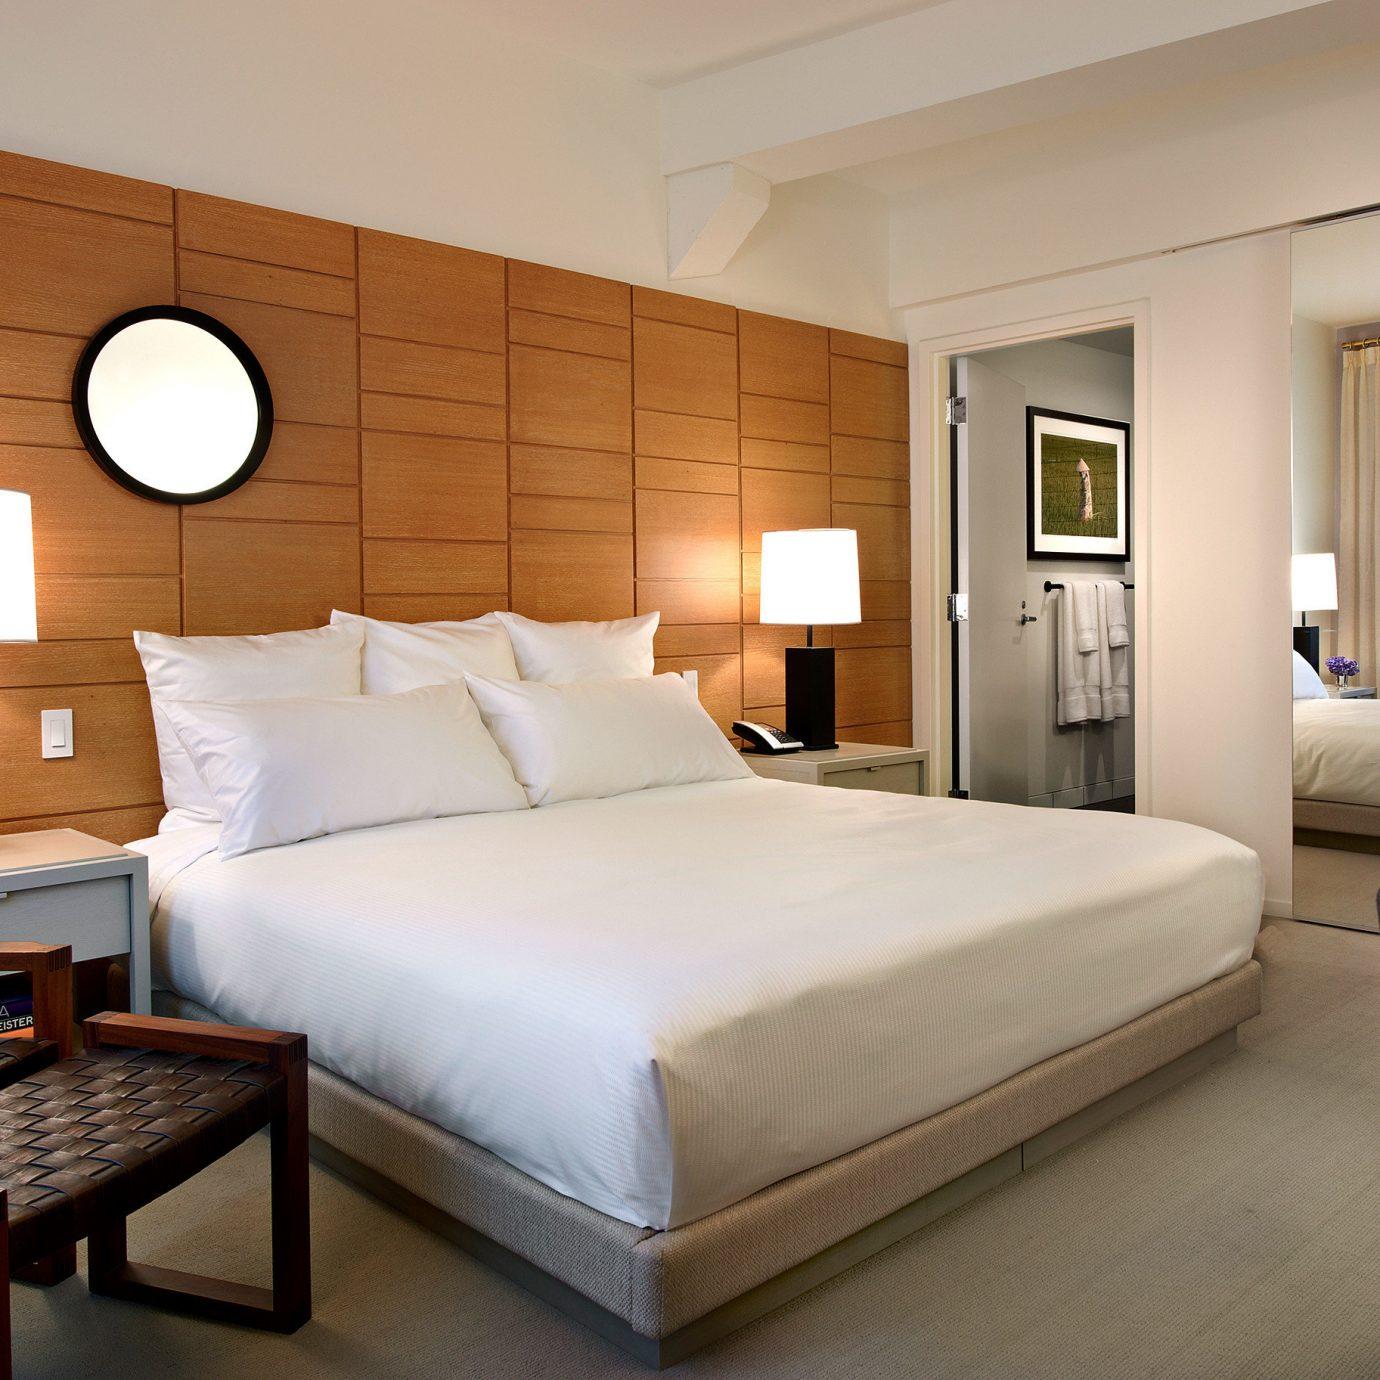 Bedroom Boutique Food + Drink Lounge Modern property Suite home living room cottage condominium